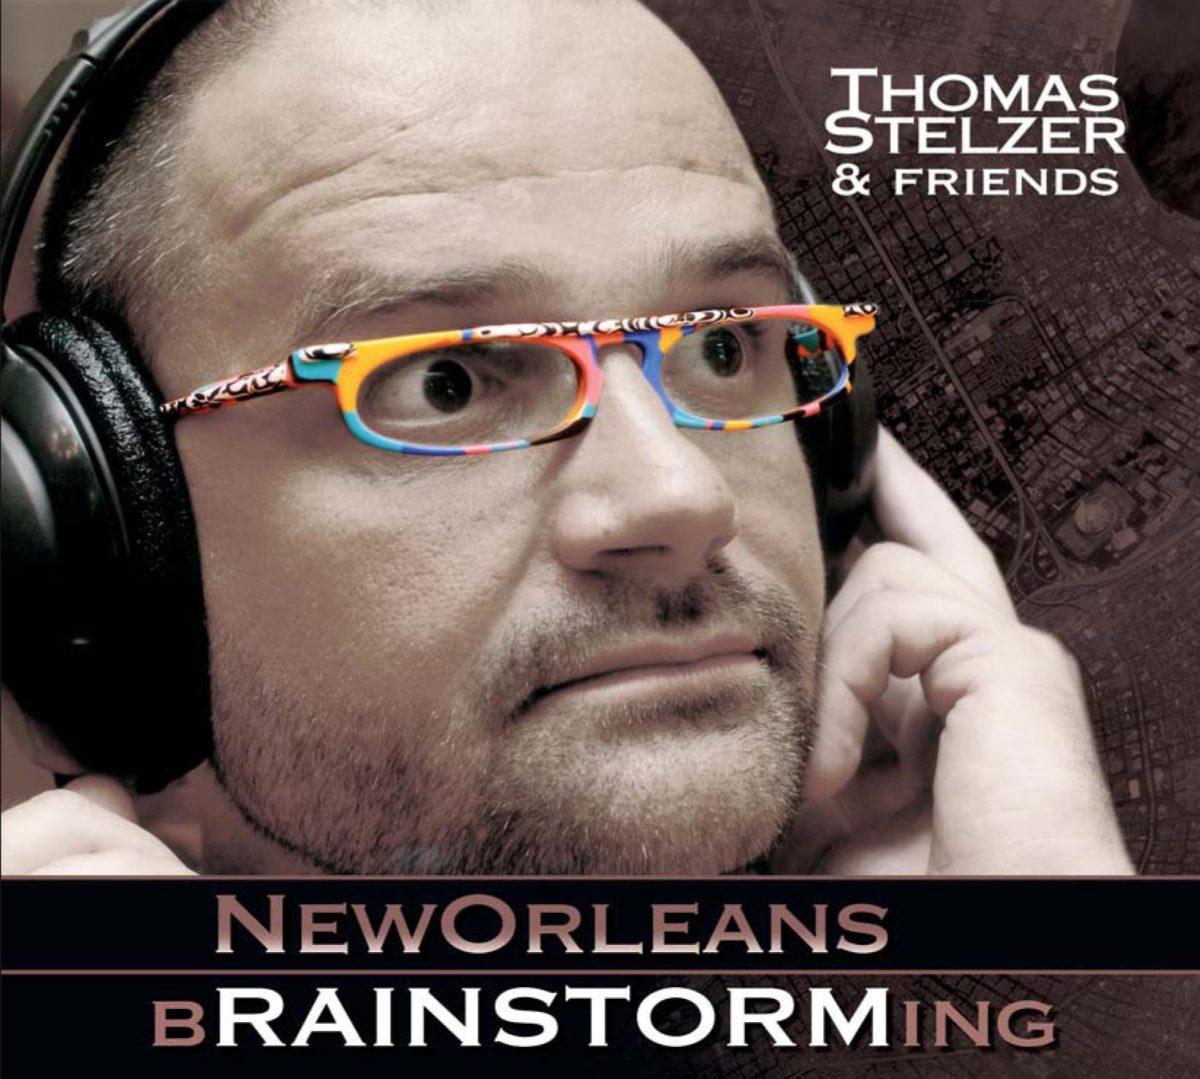 Thomas Stelzer - bRAINSTORMing